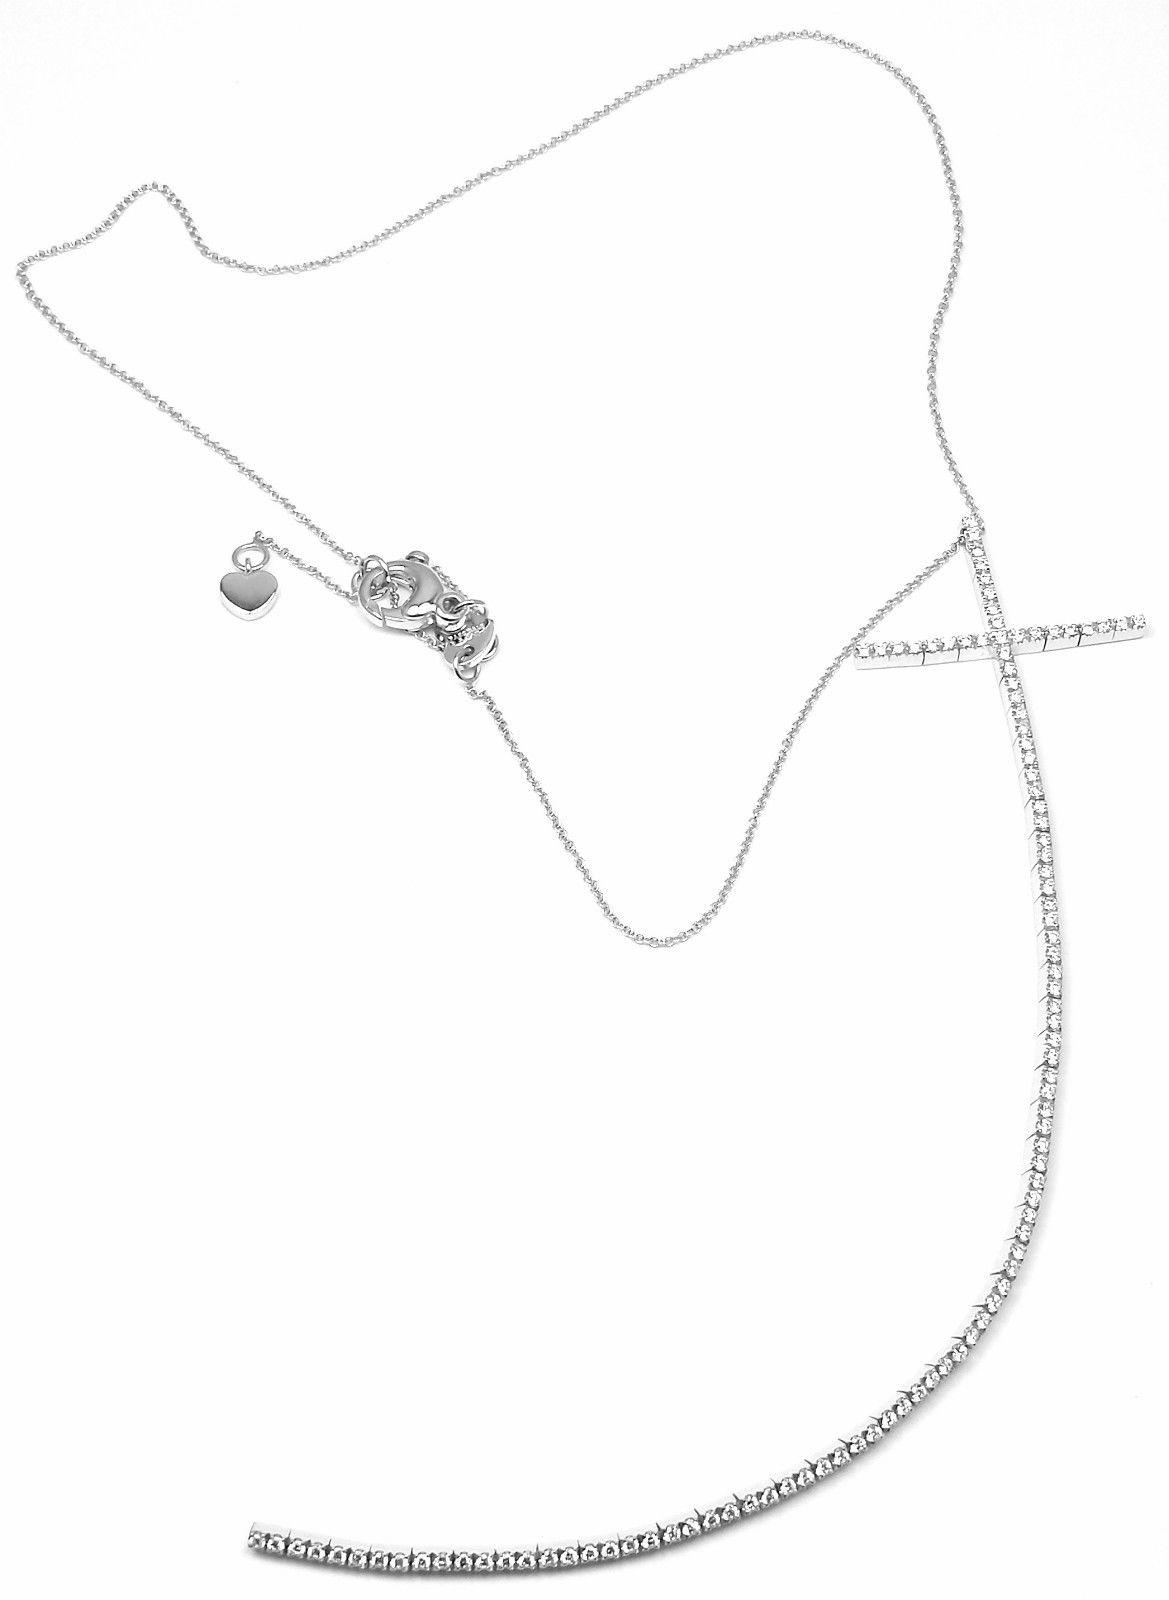 """""Pasquale Bruni 18K White Gold Cross Riviera Pendant Necklace"""""" 263496"